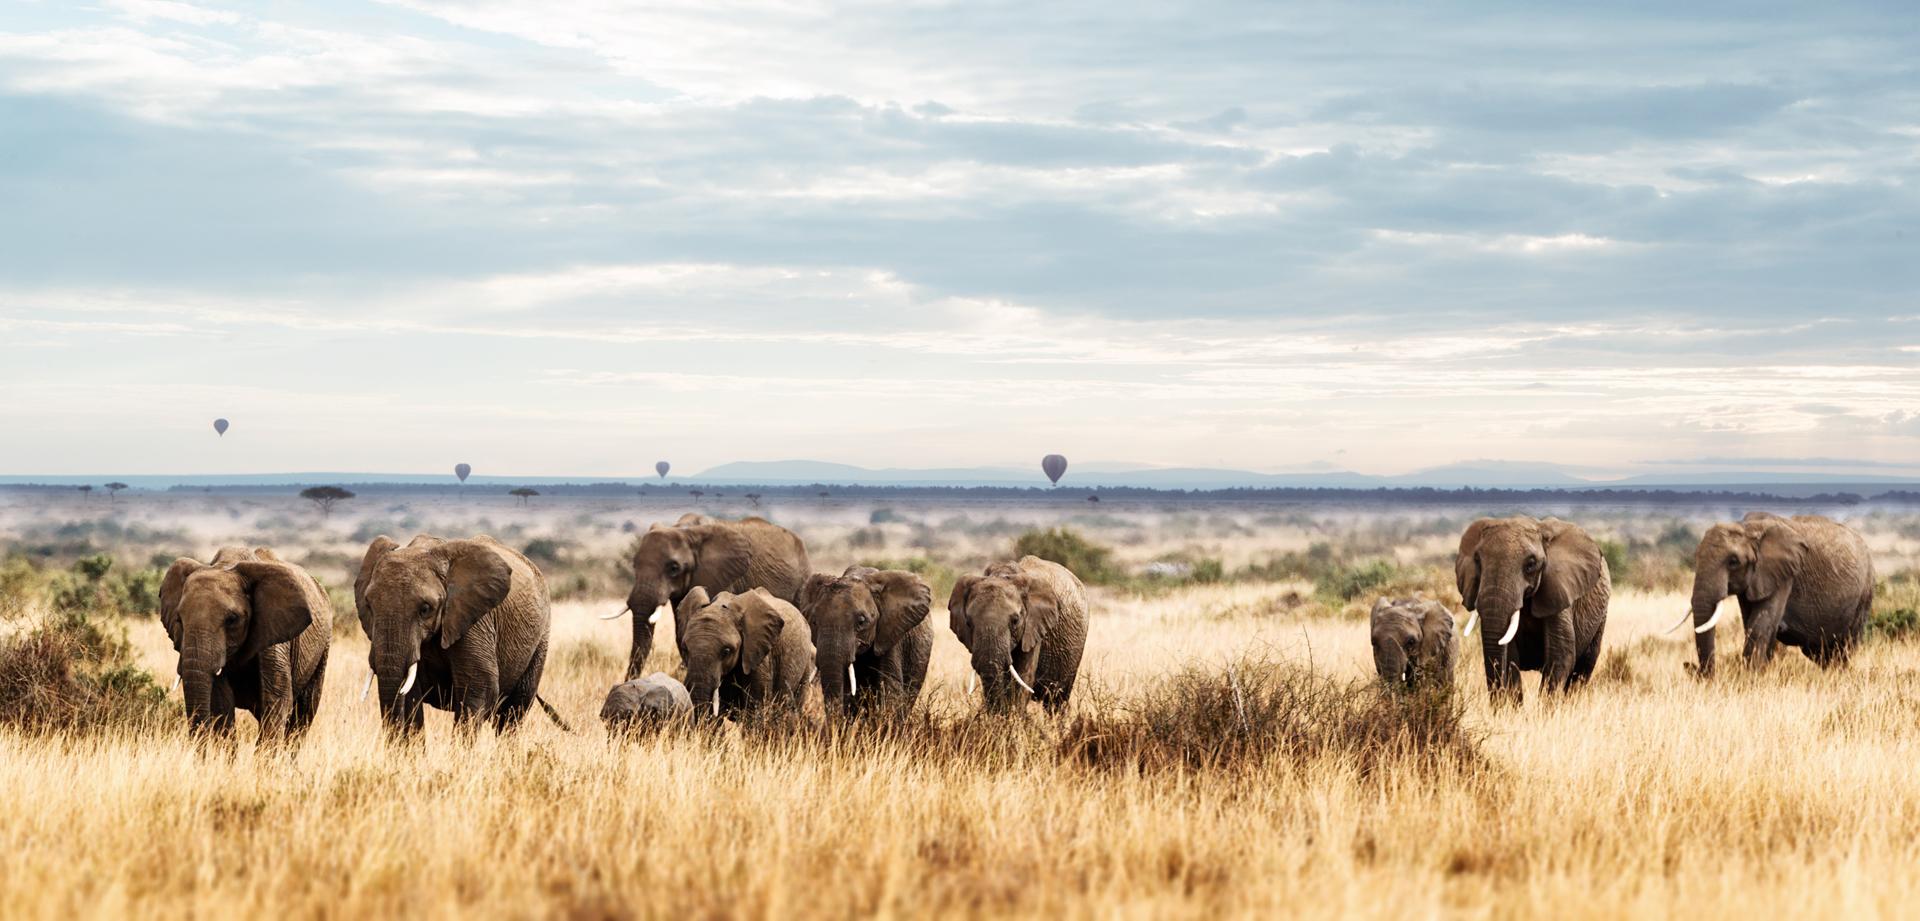 Herd of Elephant in Kenya Africa.jpg